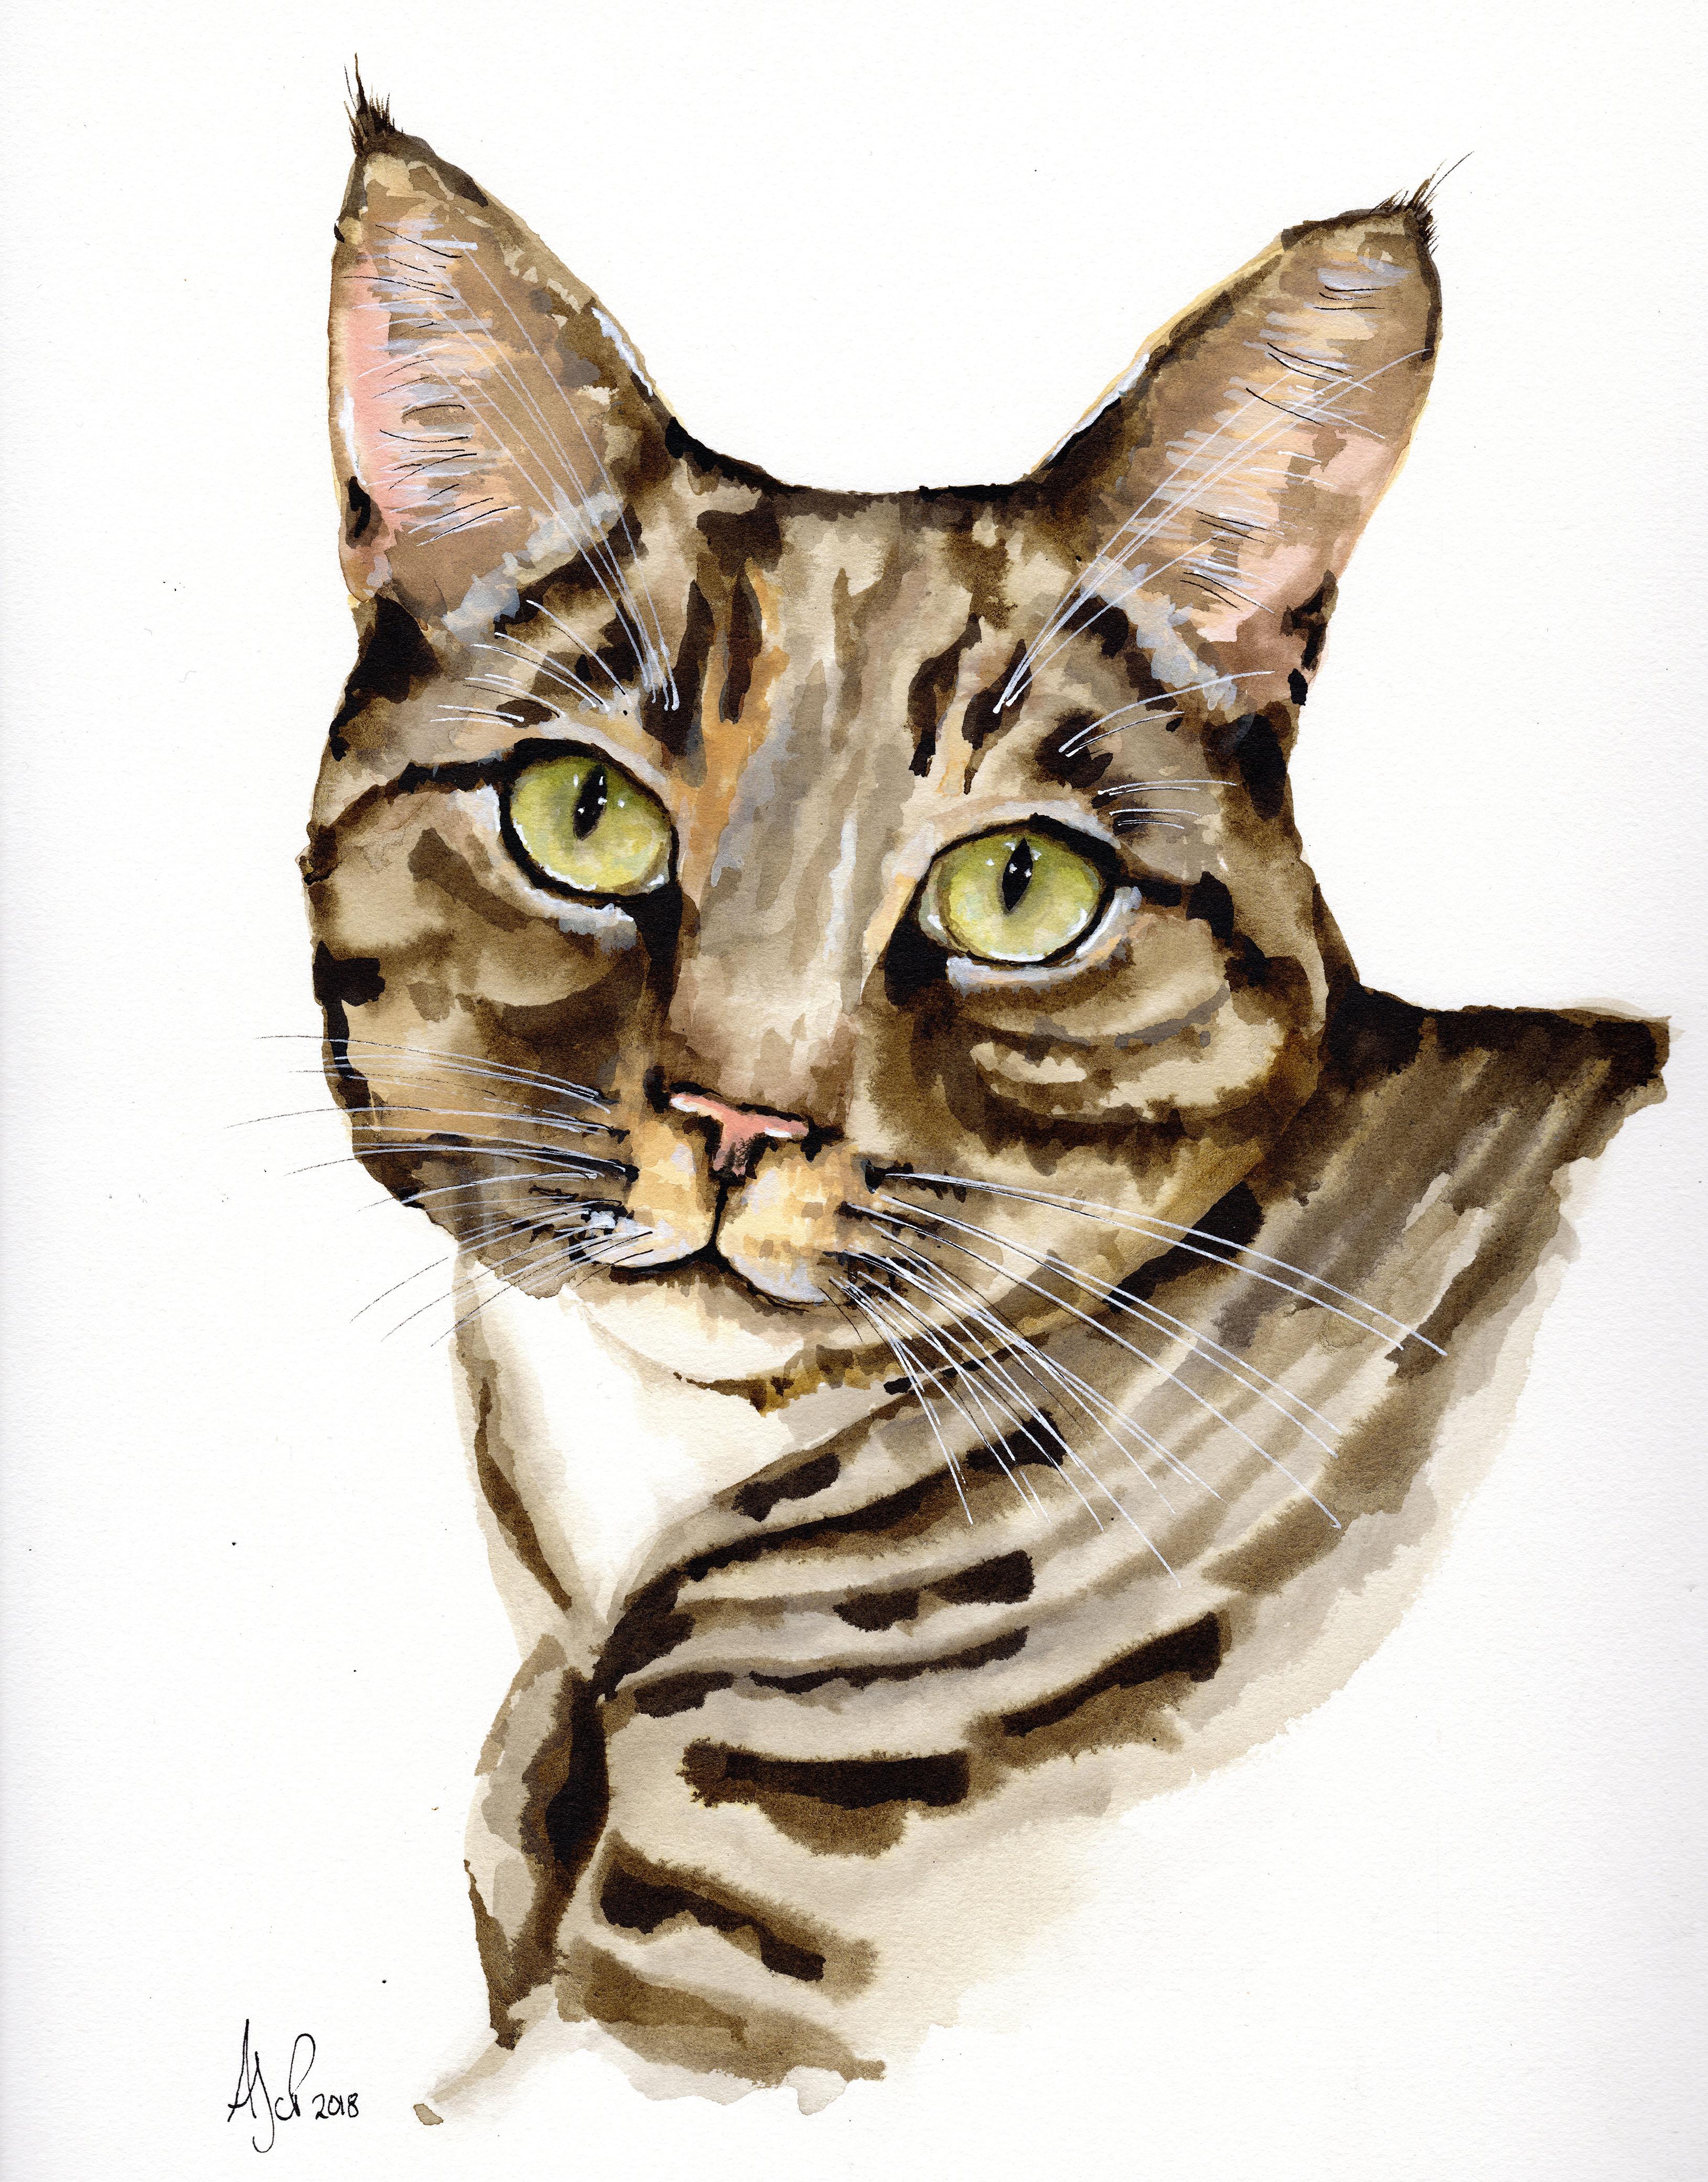 A3 Tigs Cat